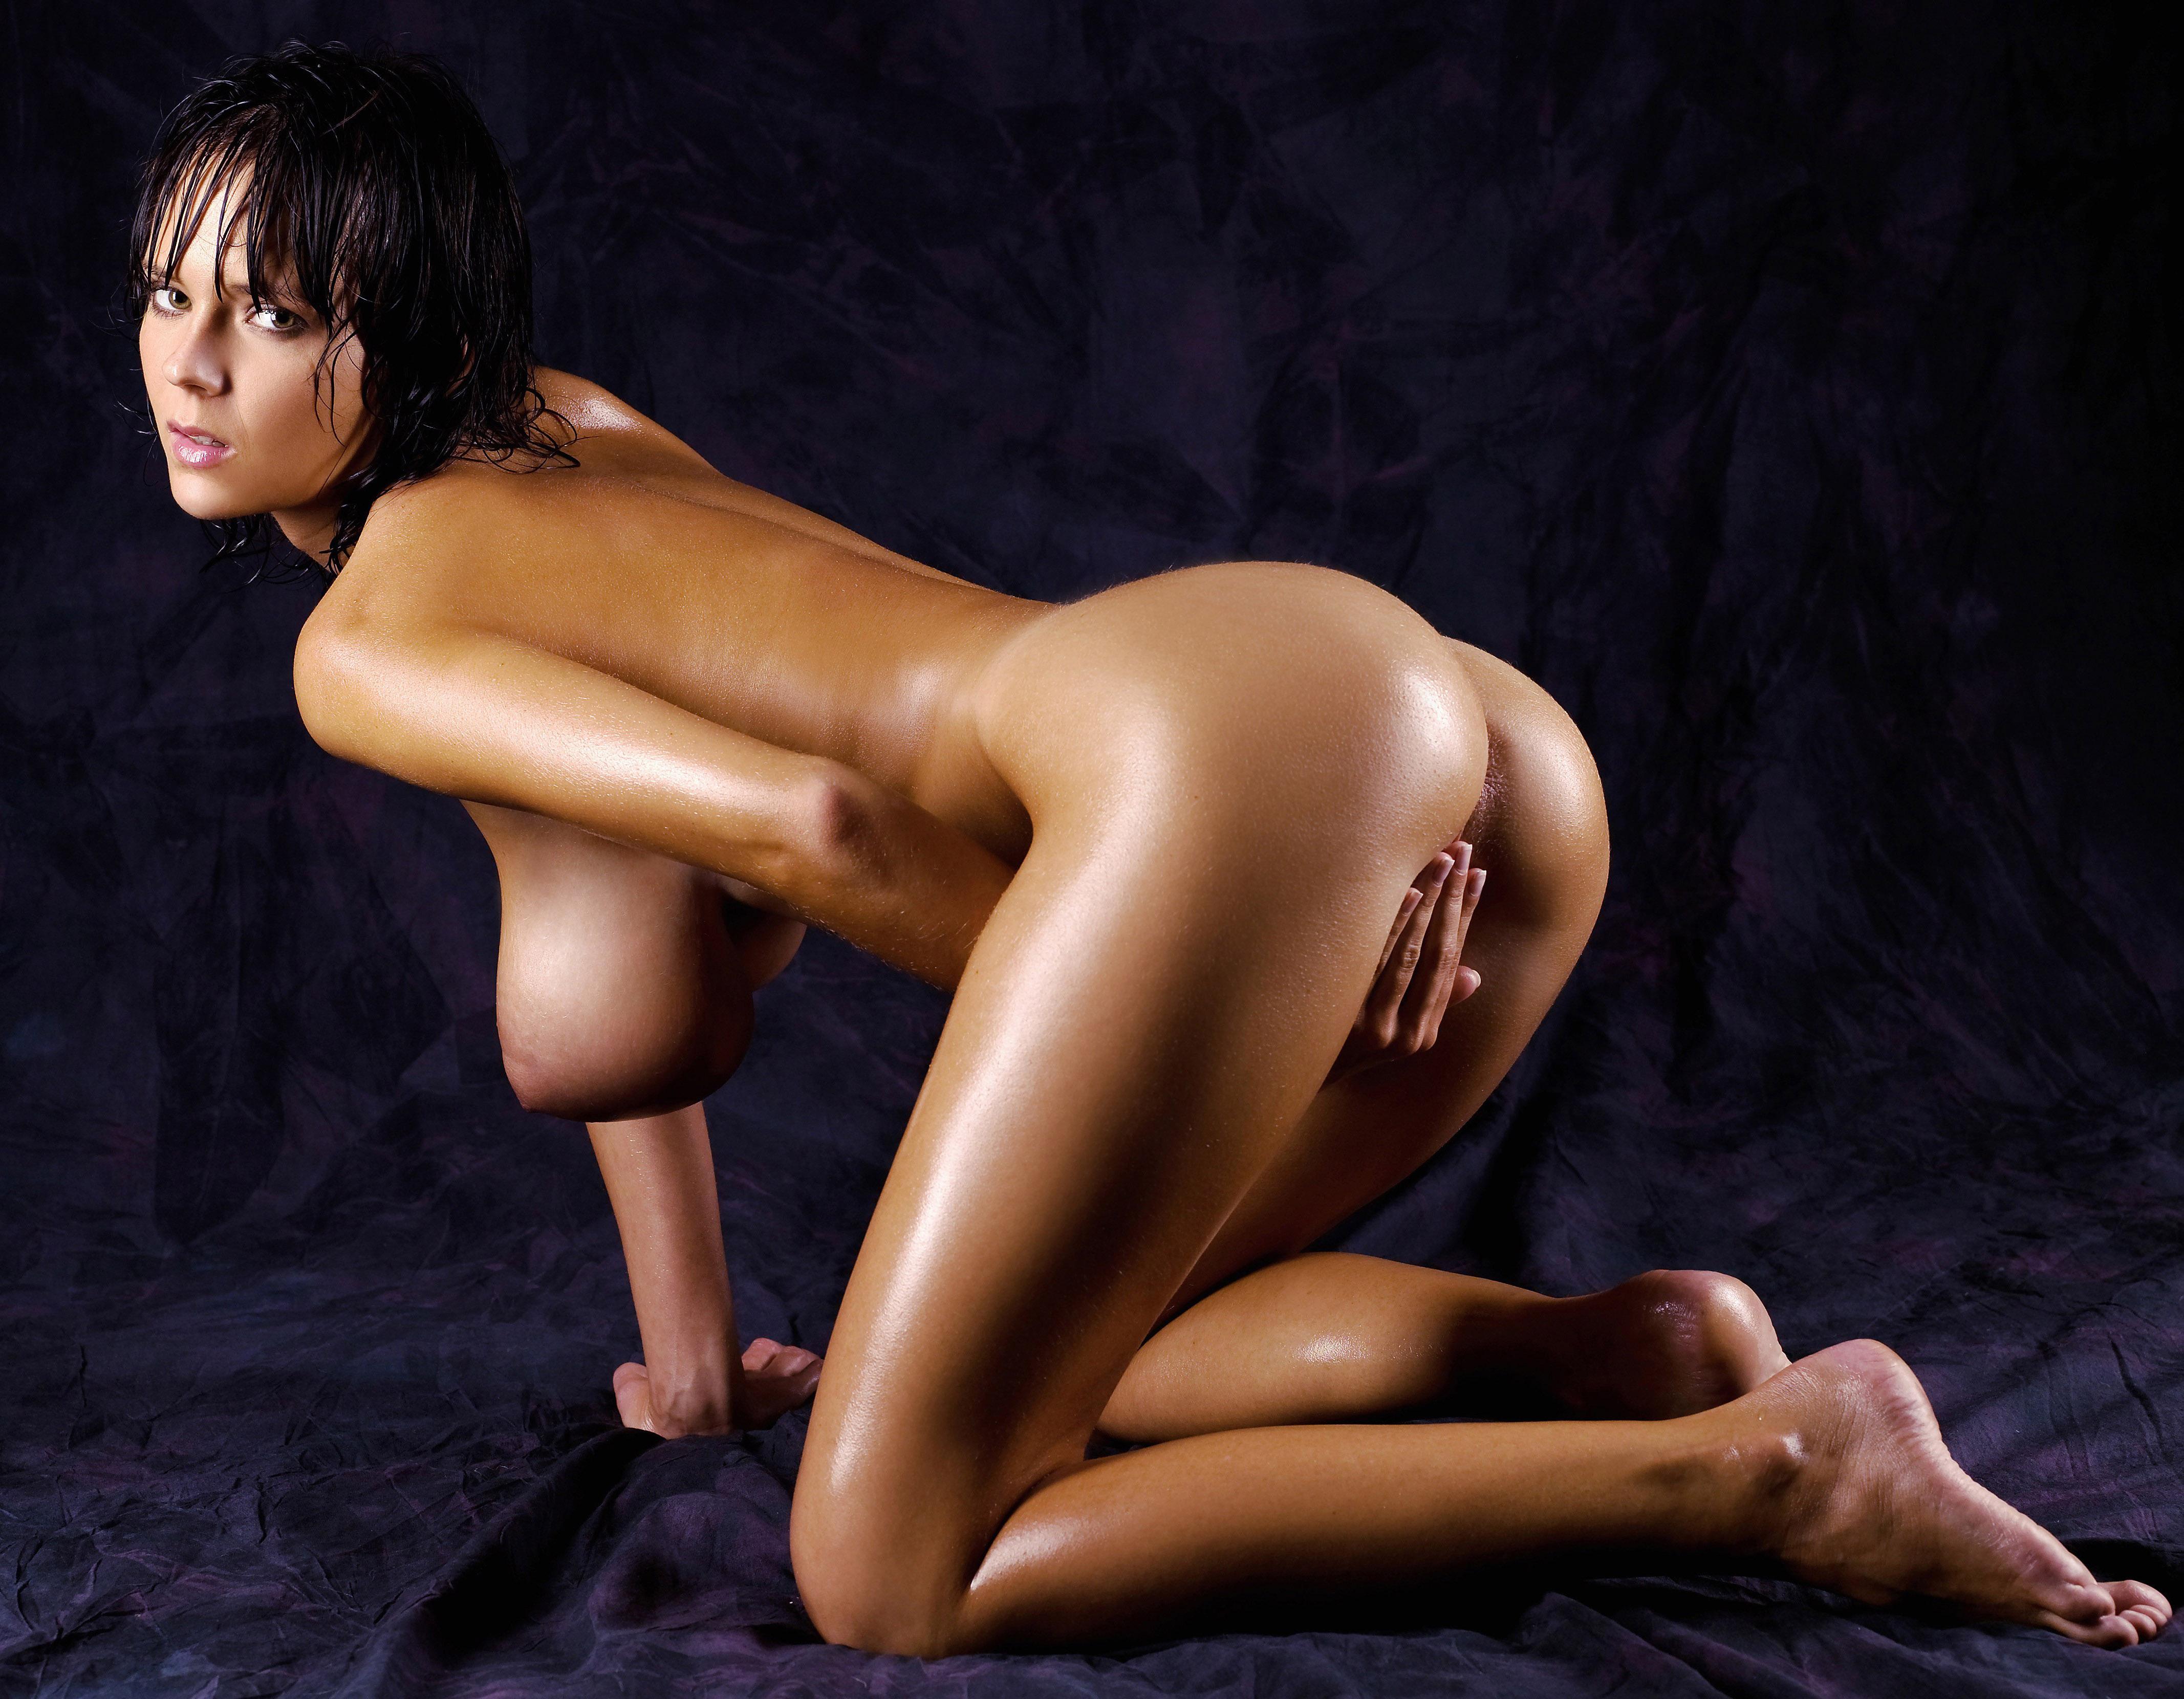 Webmaster pantyhose sex video